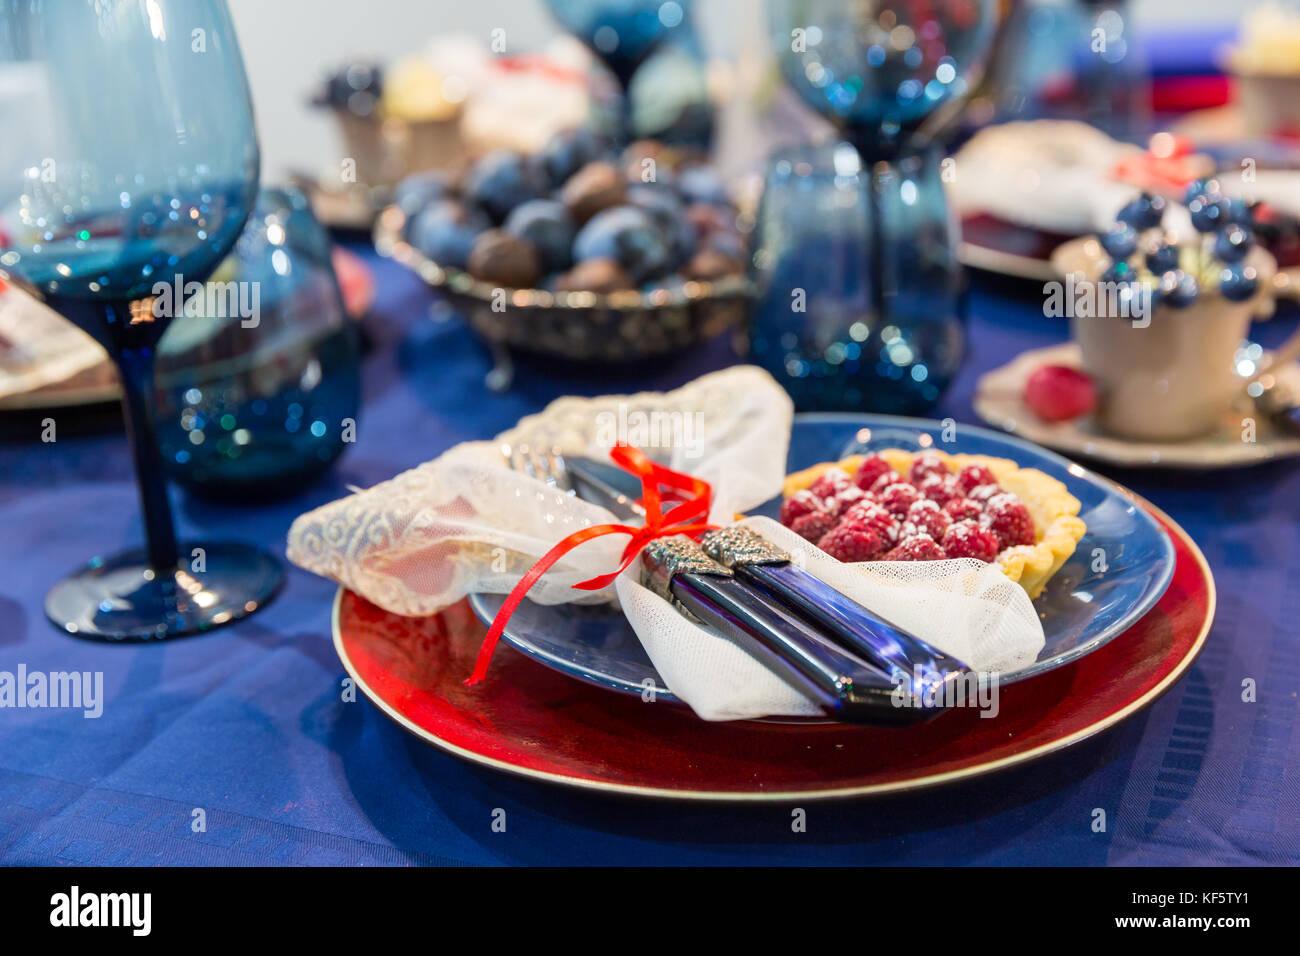 Tabelle mit Nahrungsmitteln Dekoration closeup, niemand Stockbild